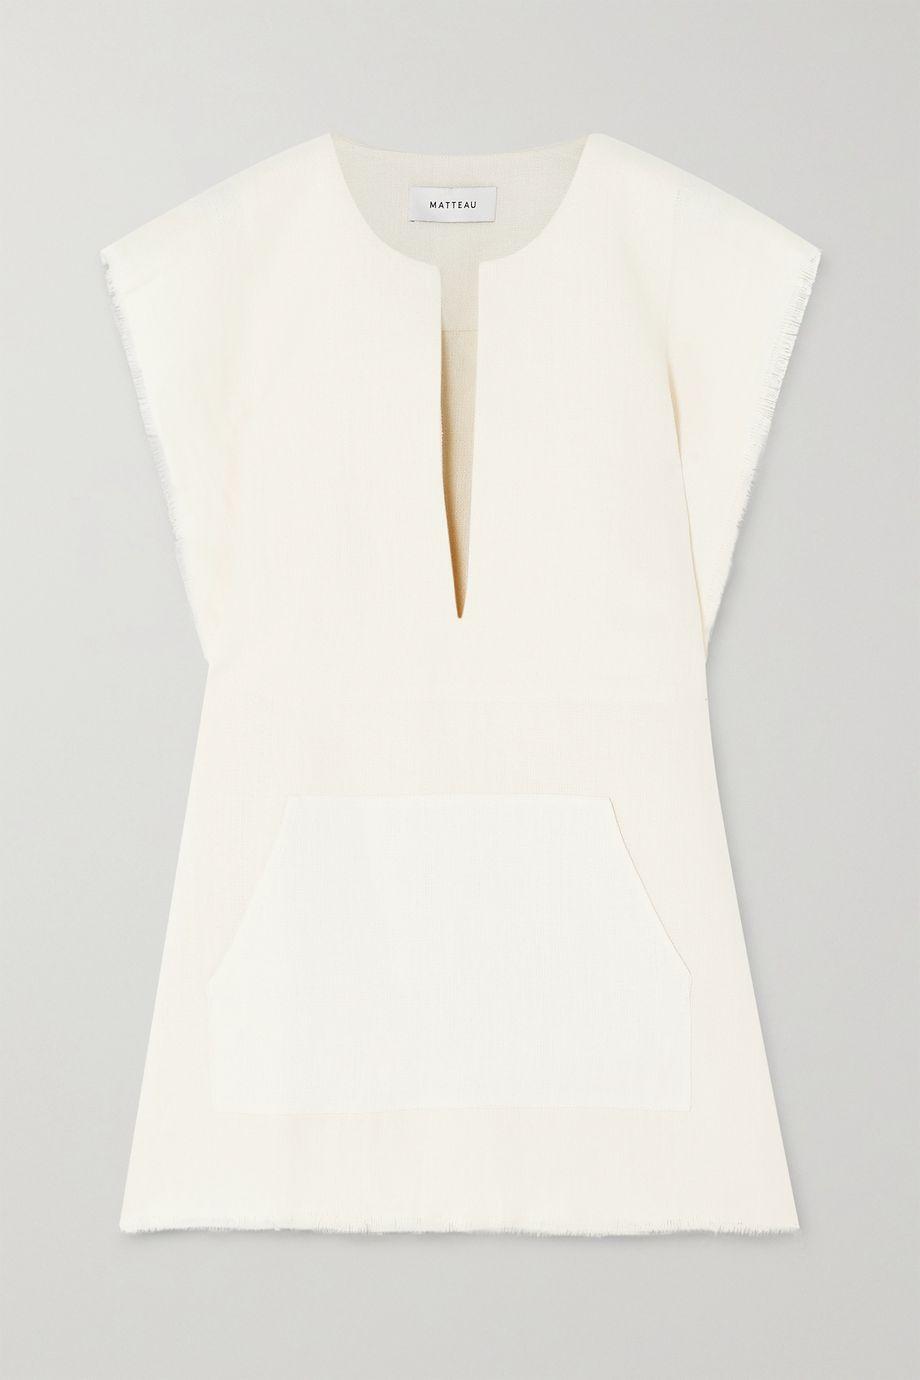 Matteau Oversized frayed linen poncho